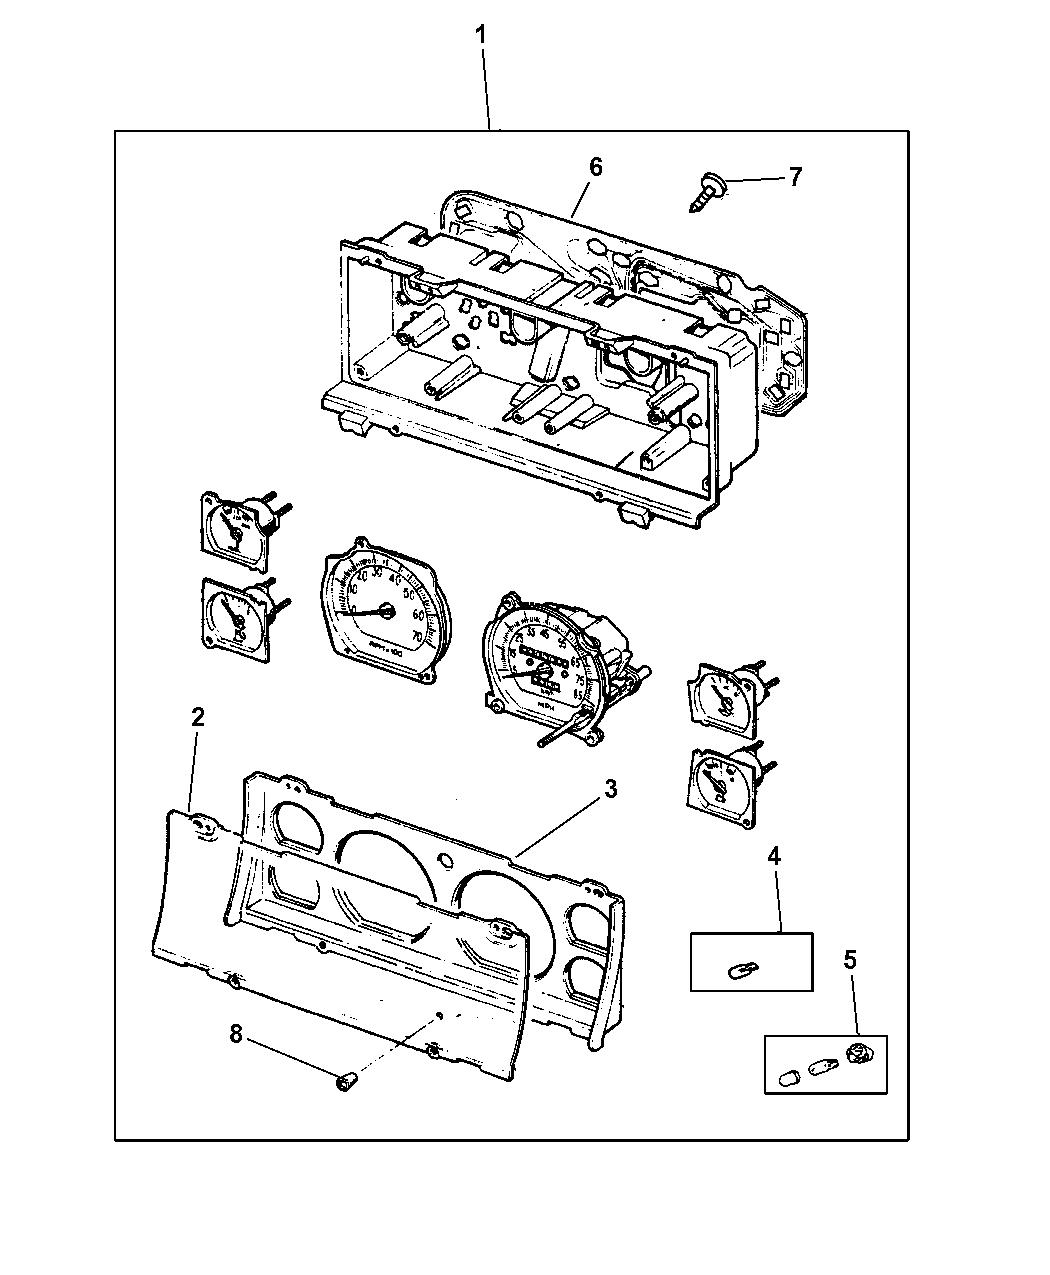 Jeep Cherokee Cluster Instrument Panel